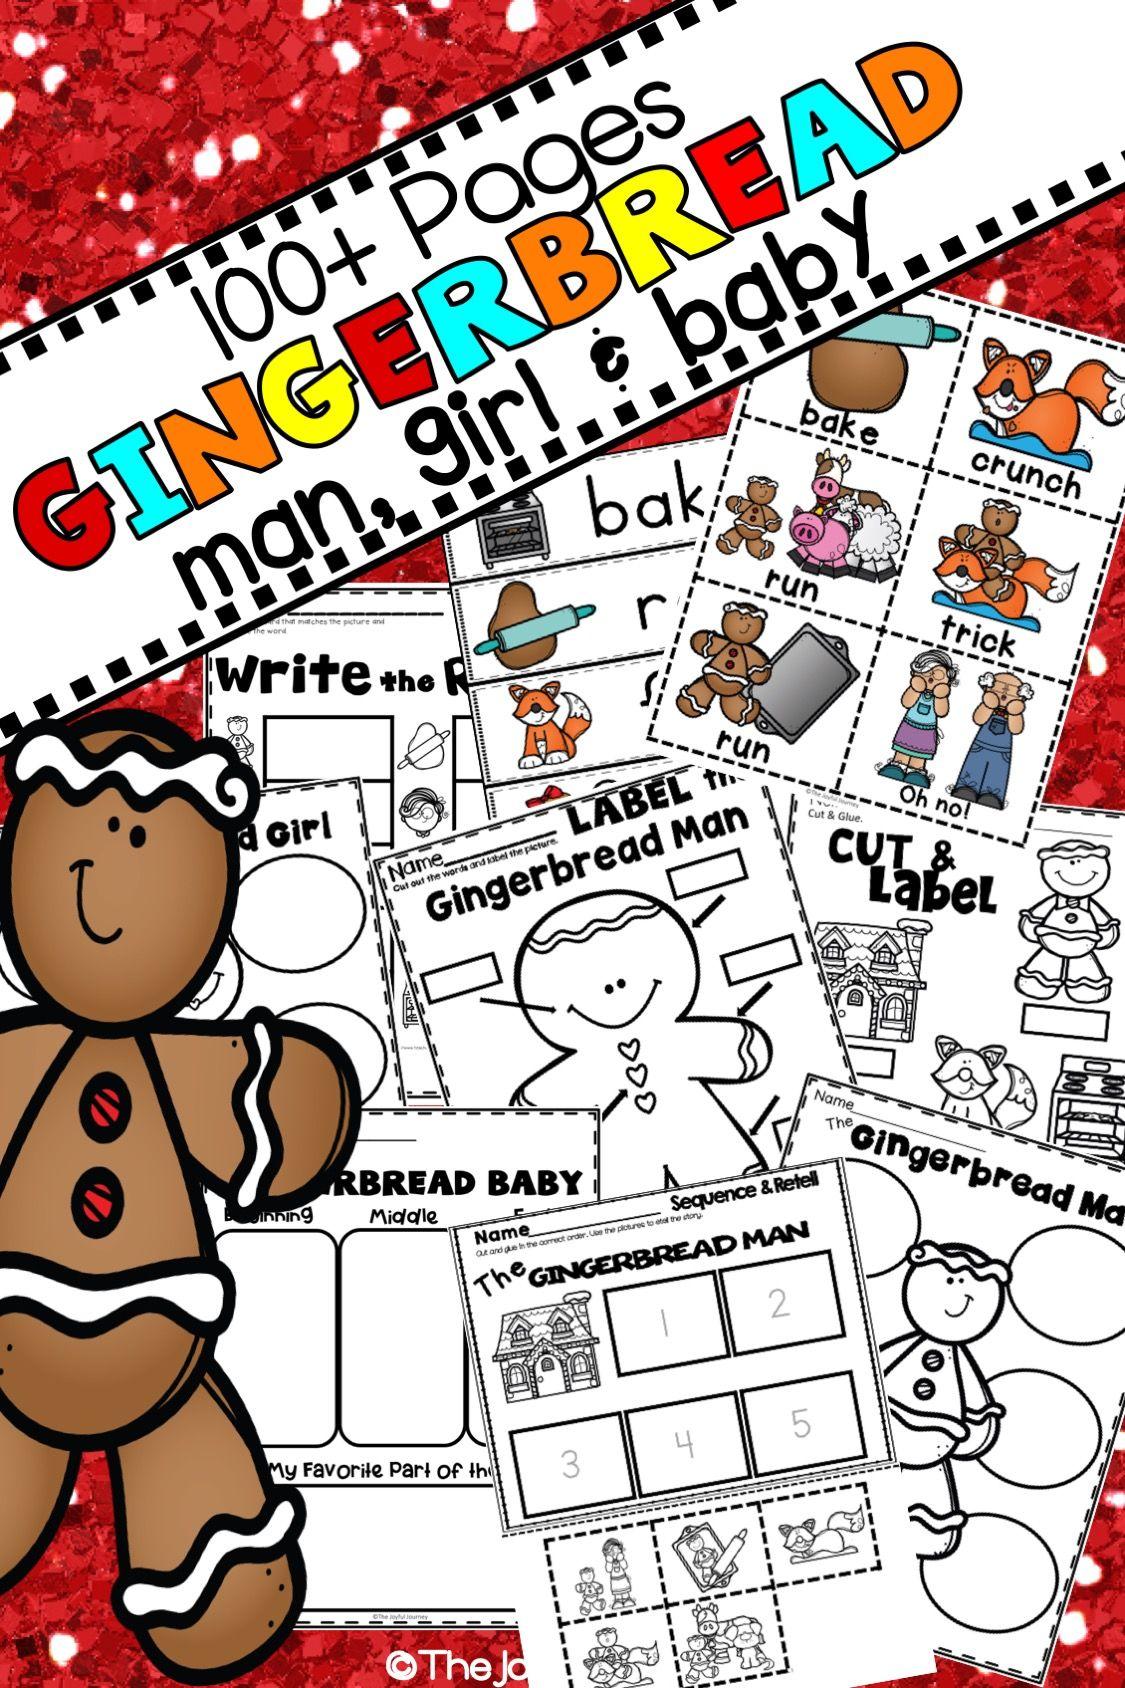 Gingerbread Man Girl Baby Story Activities Gingerbread Man Activities Kindergarten Gingerbread Man Activities Gingerbread Story [ 1688 x 1125 Pixel ]